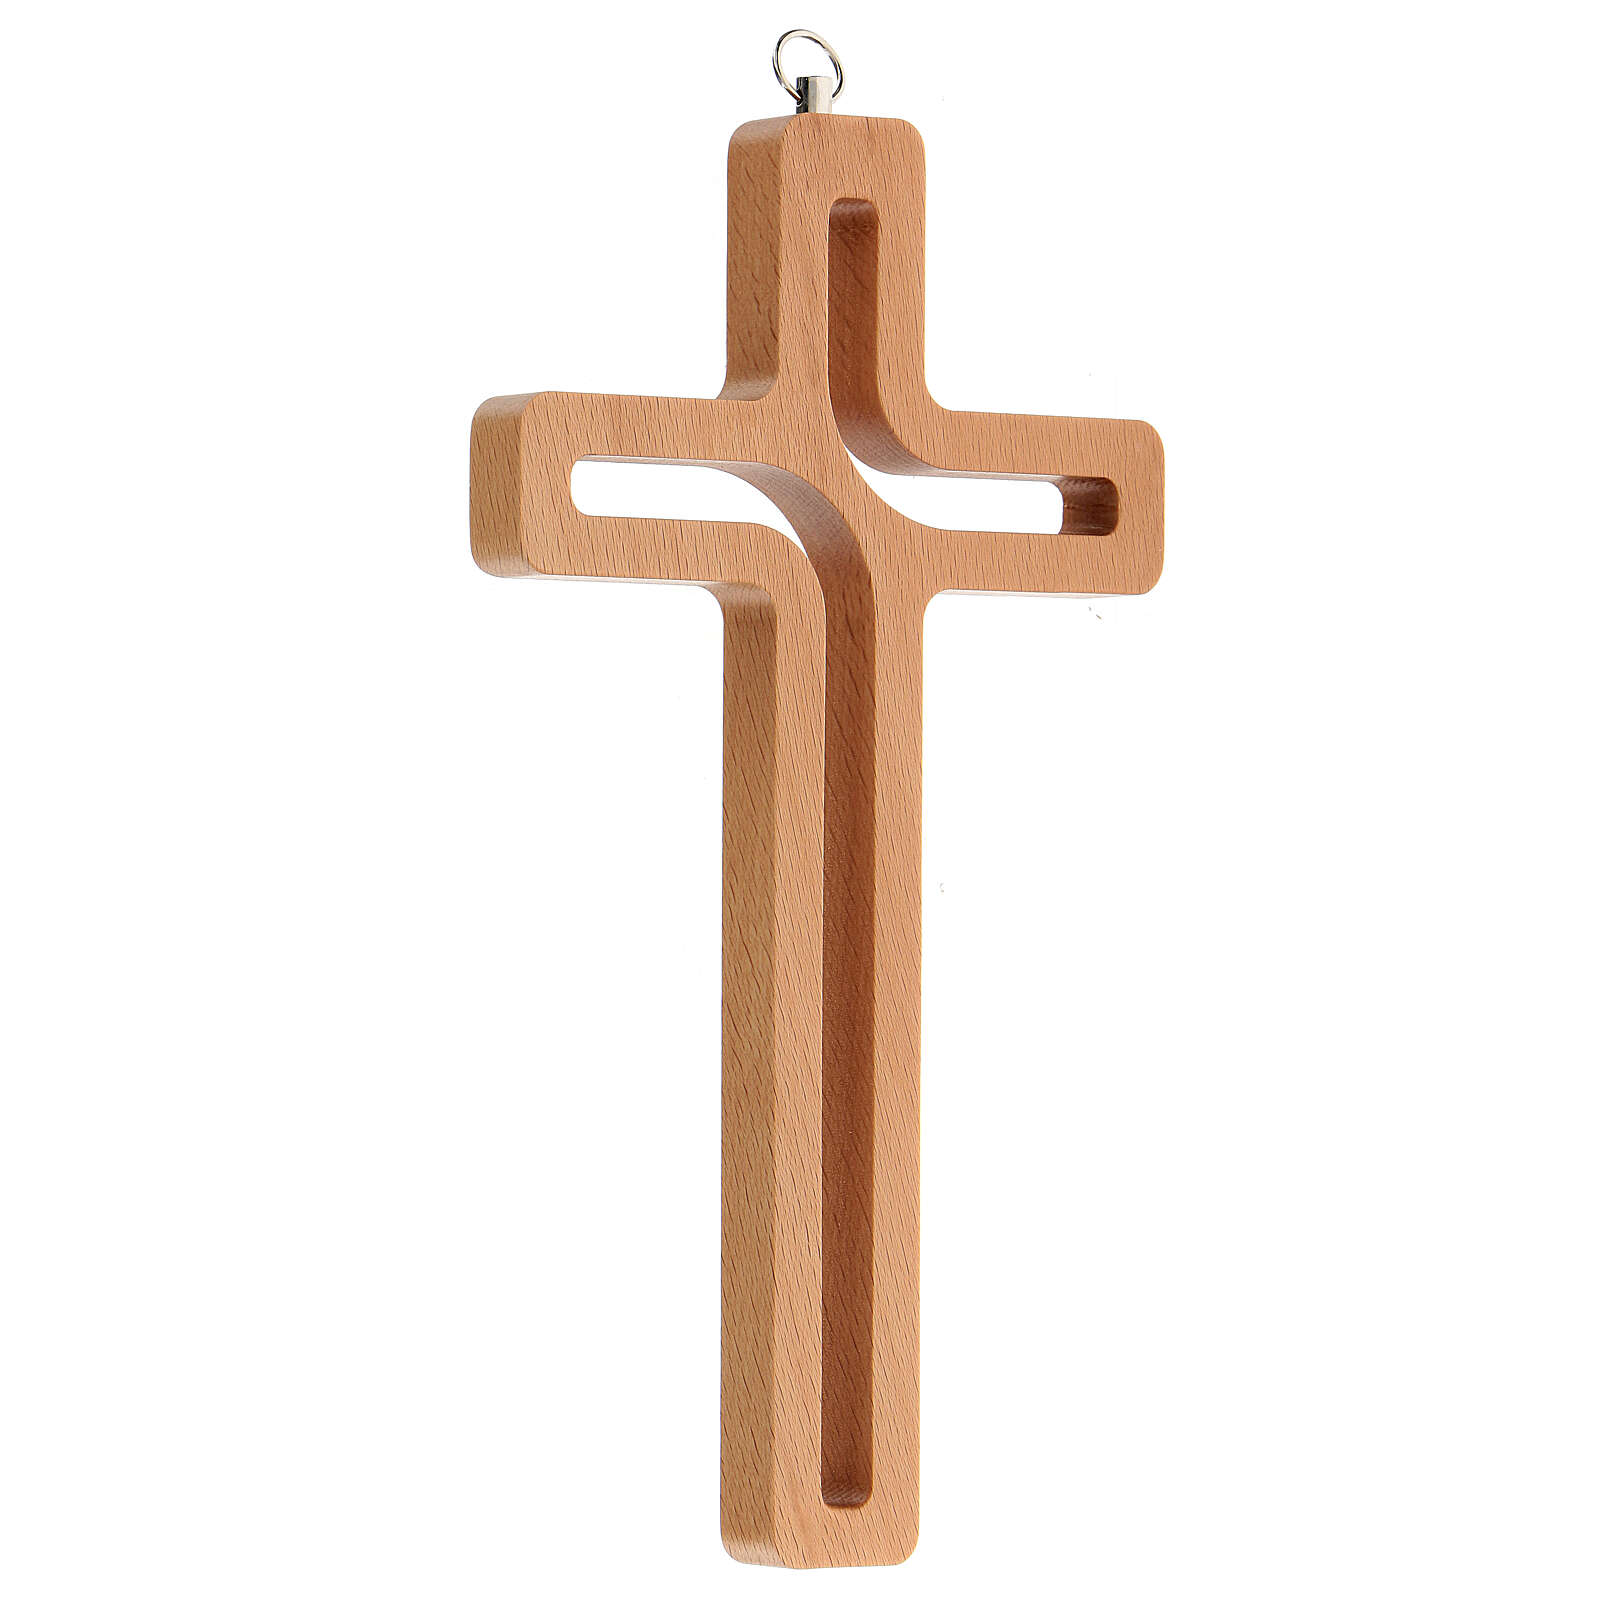 Crucifijo perforado madera colgado 20 cm 4